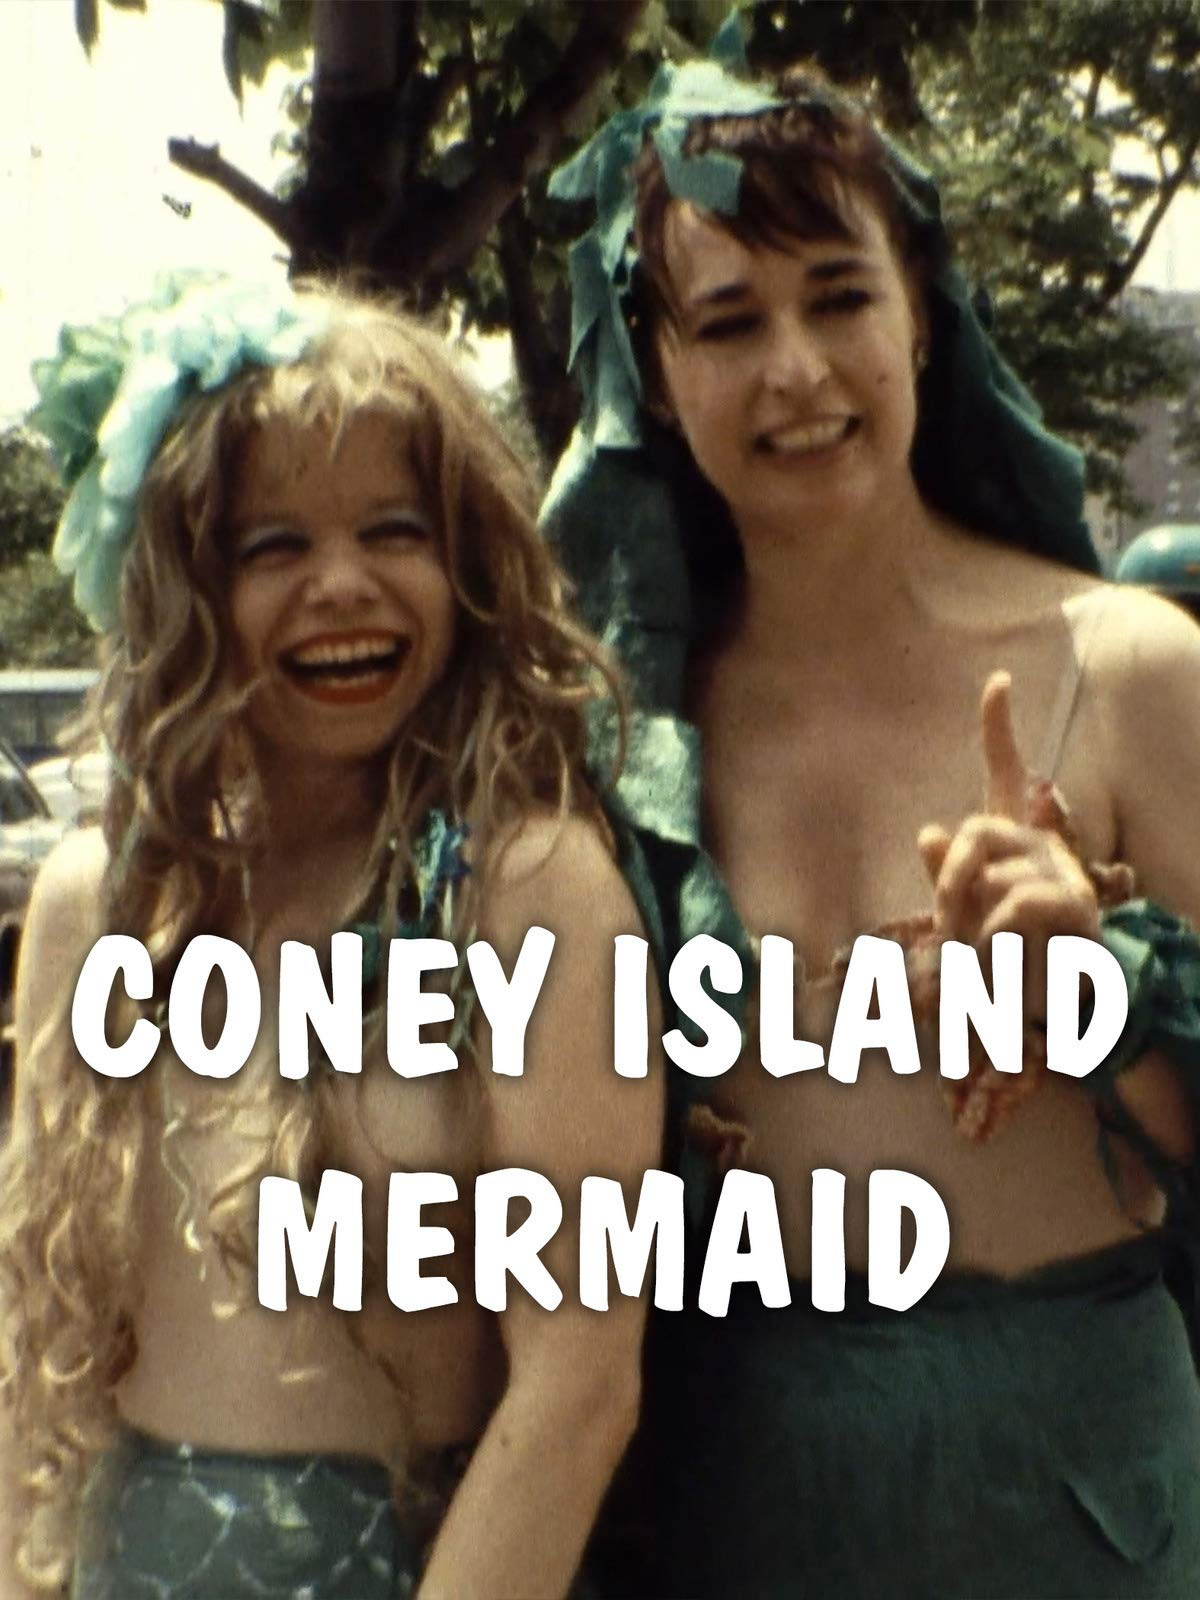 Coney Island Mermaid